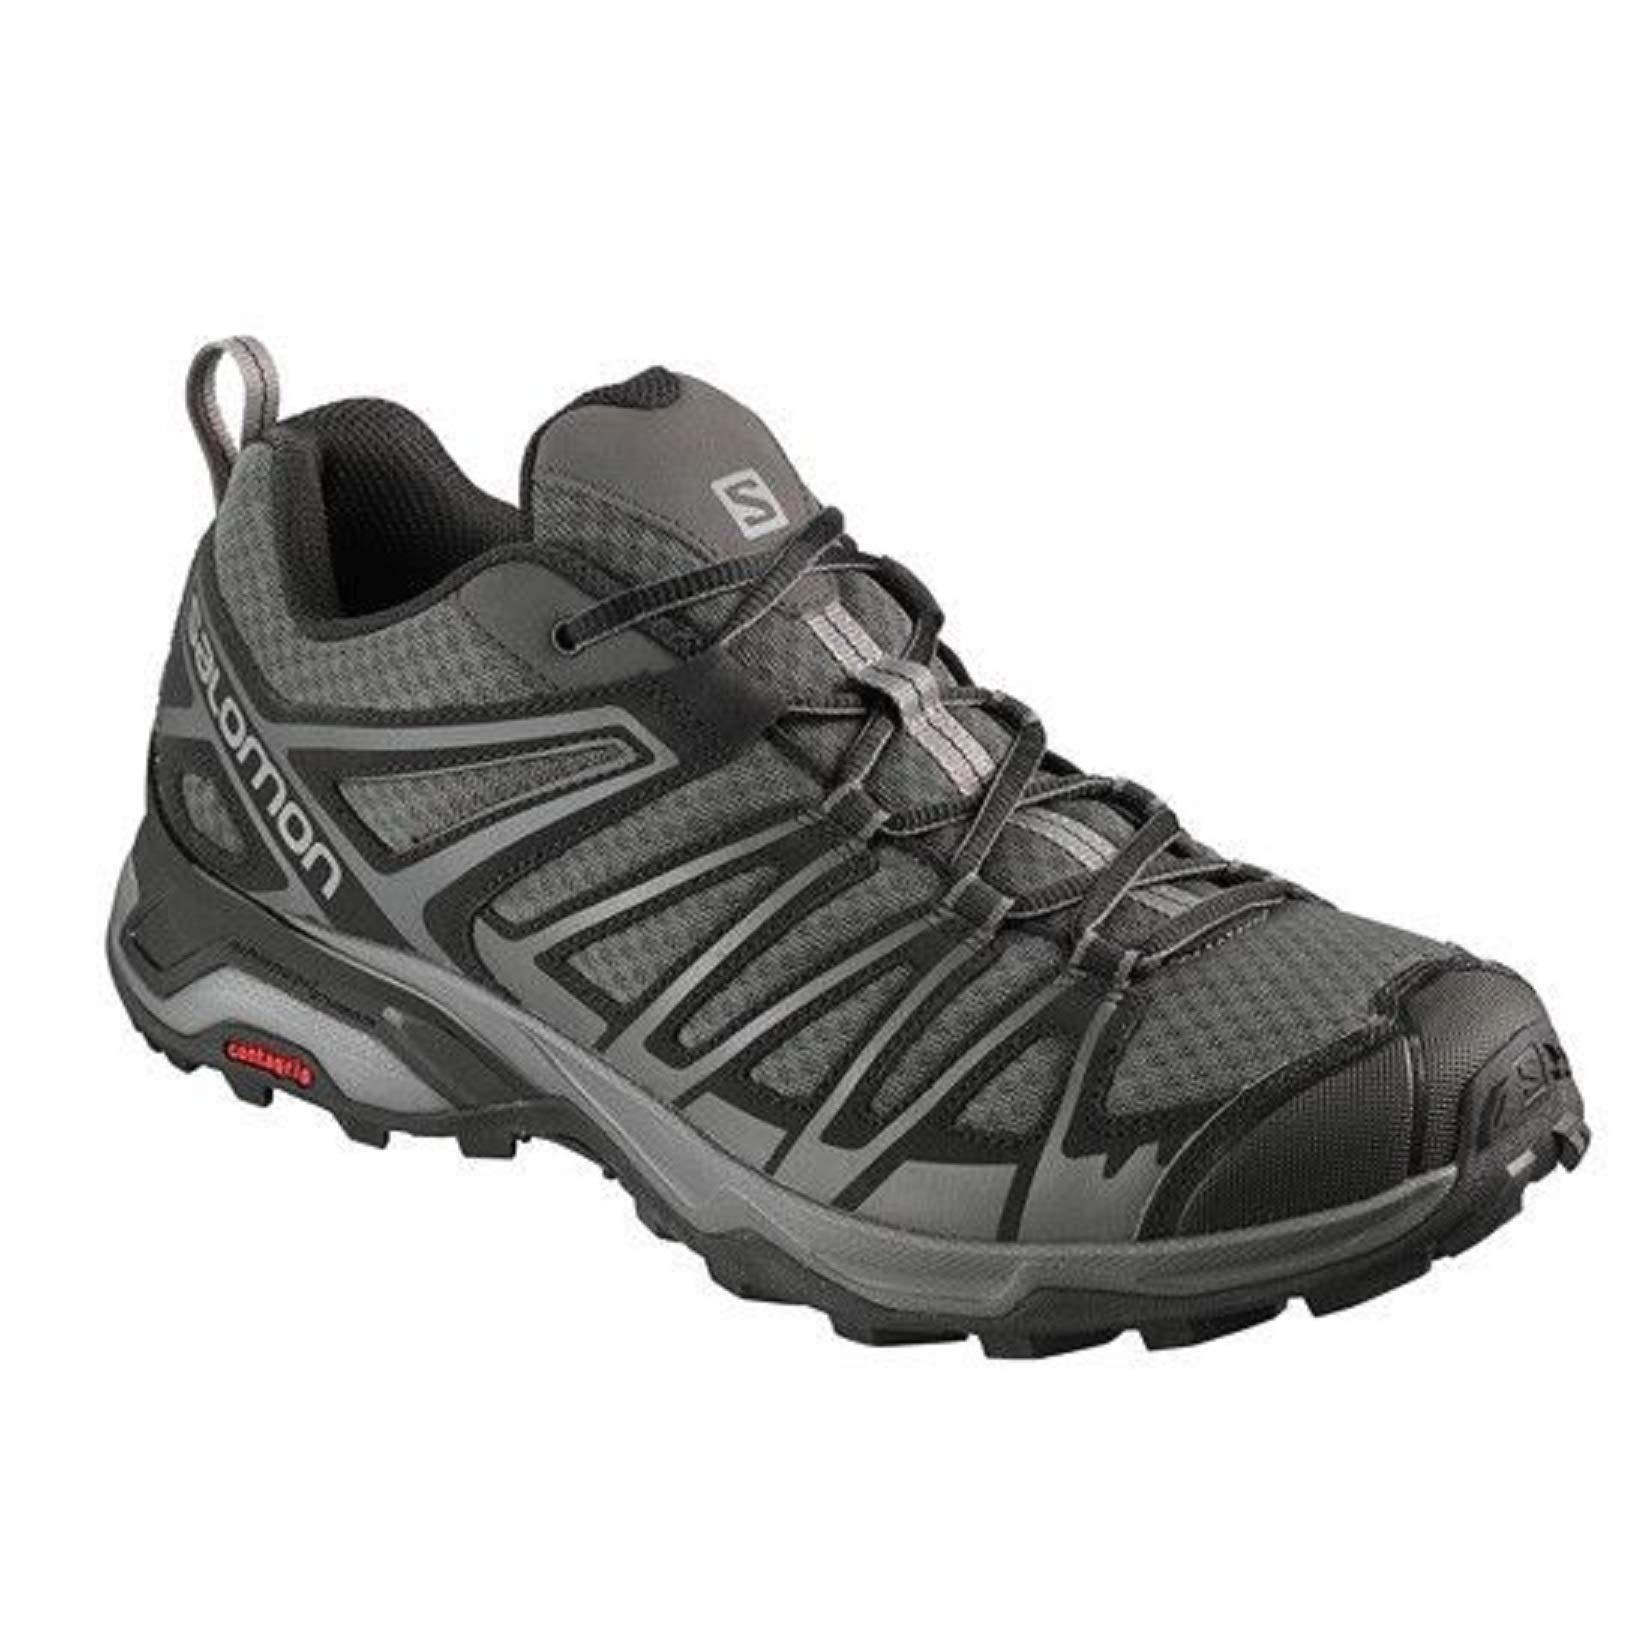 Salomon Men's Hiking Shoes, X Ultra 3